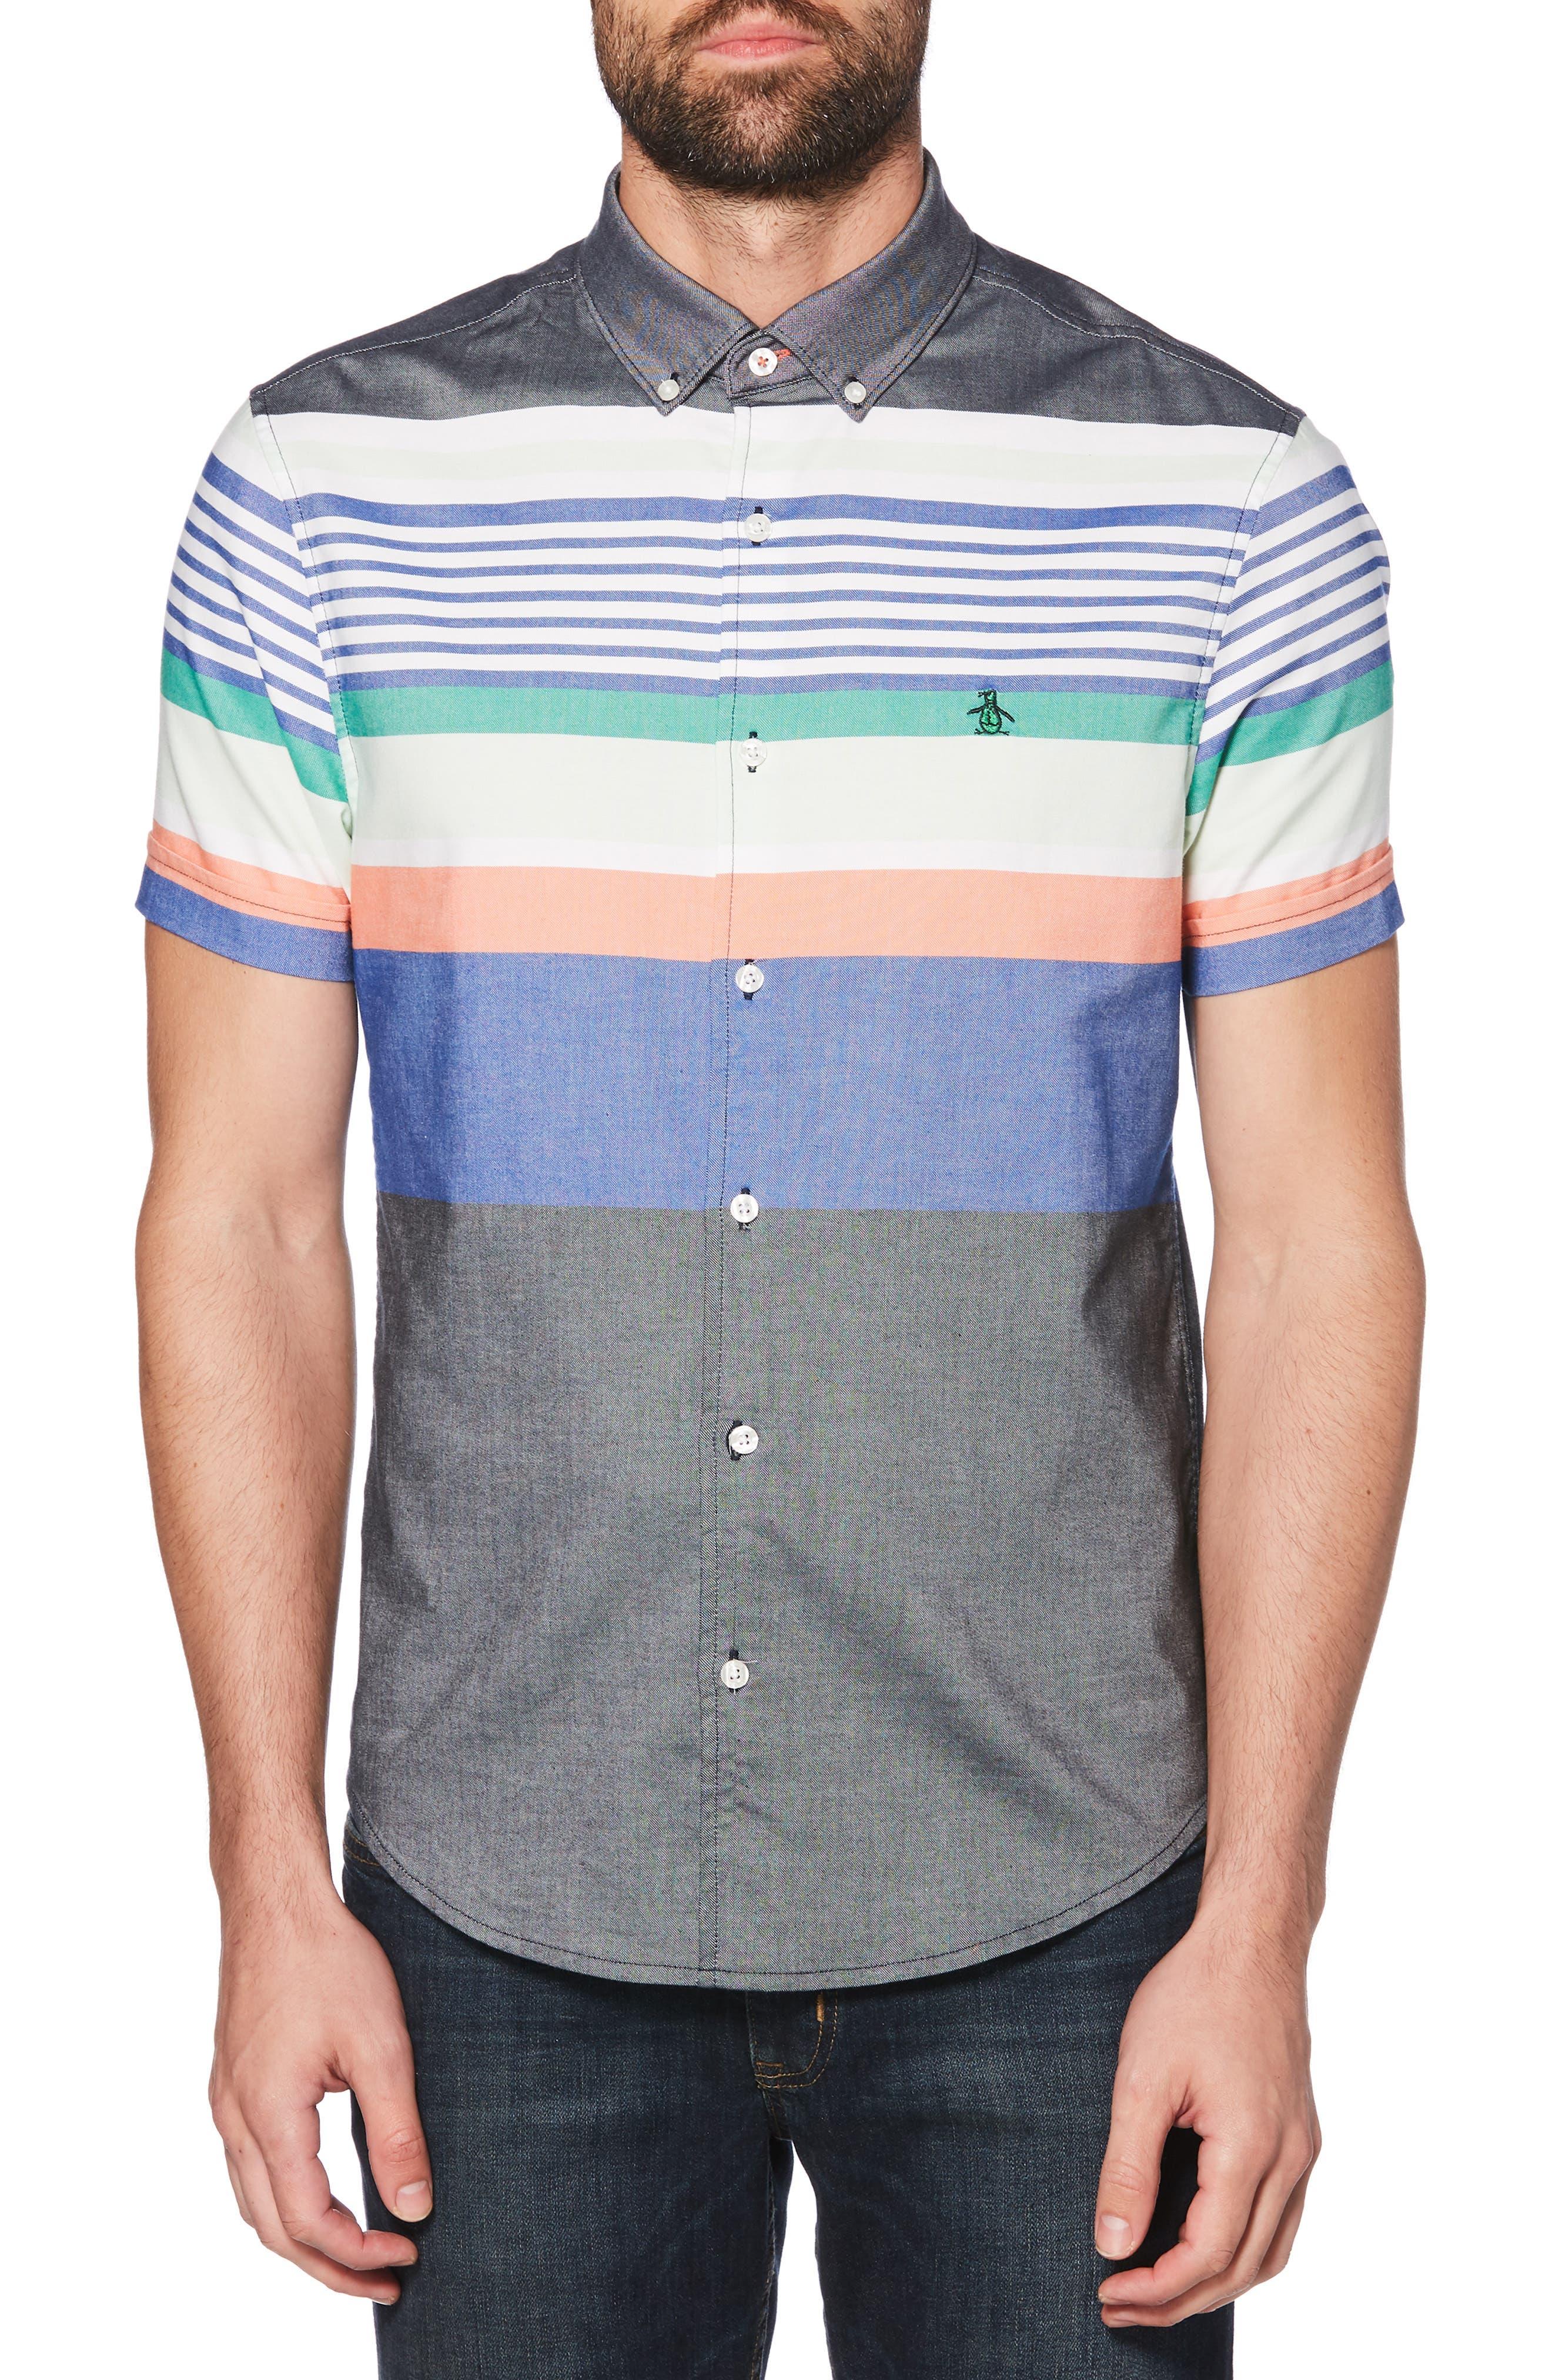 ORIGINAL PENGUIN, Engineered Stripe Woven Shirt, Main thumbnail 1, color, BRIGHT WHITE